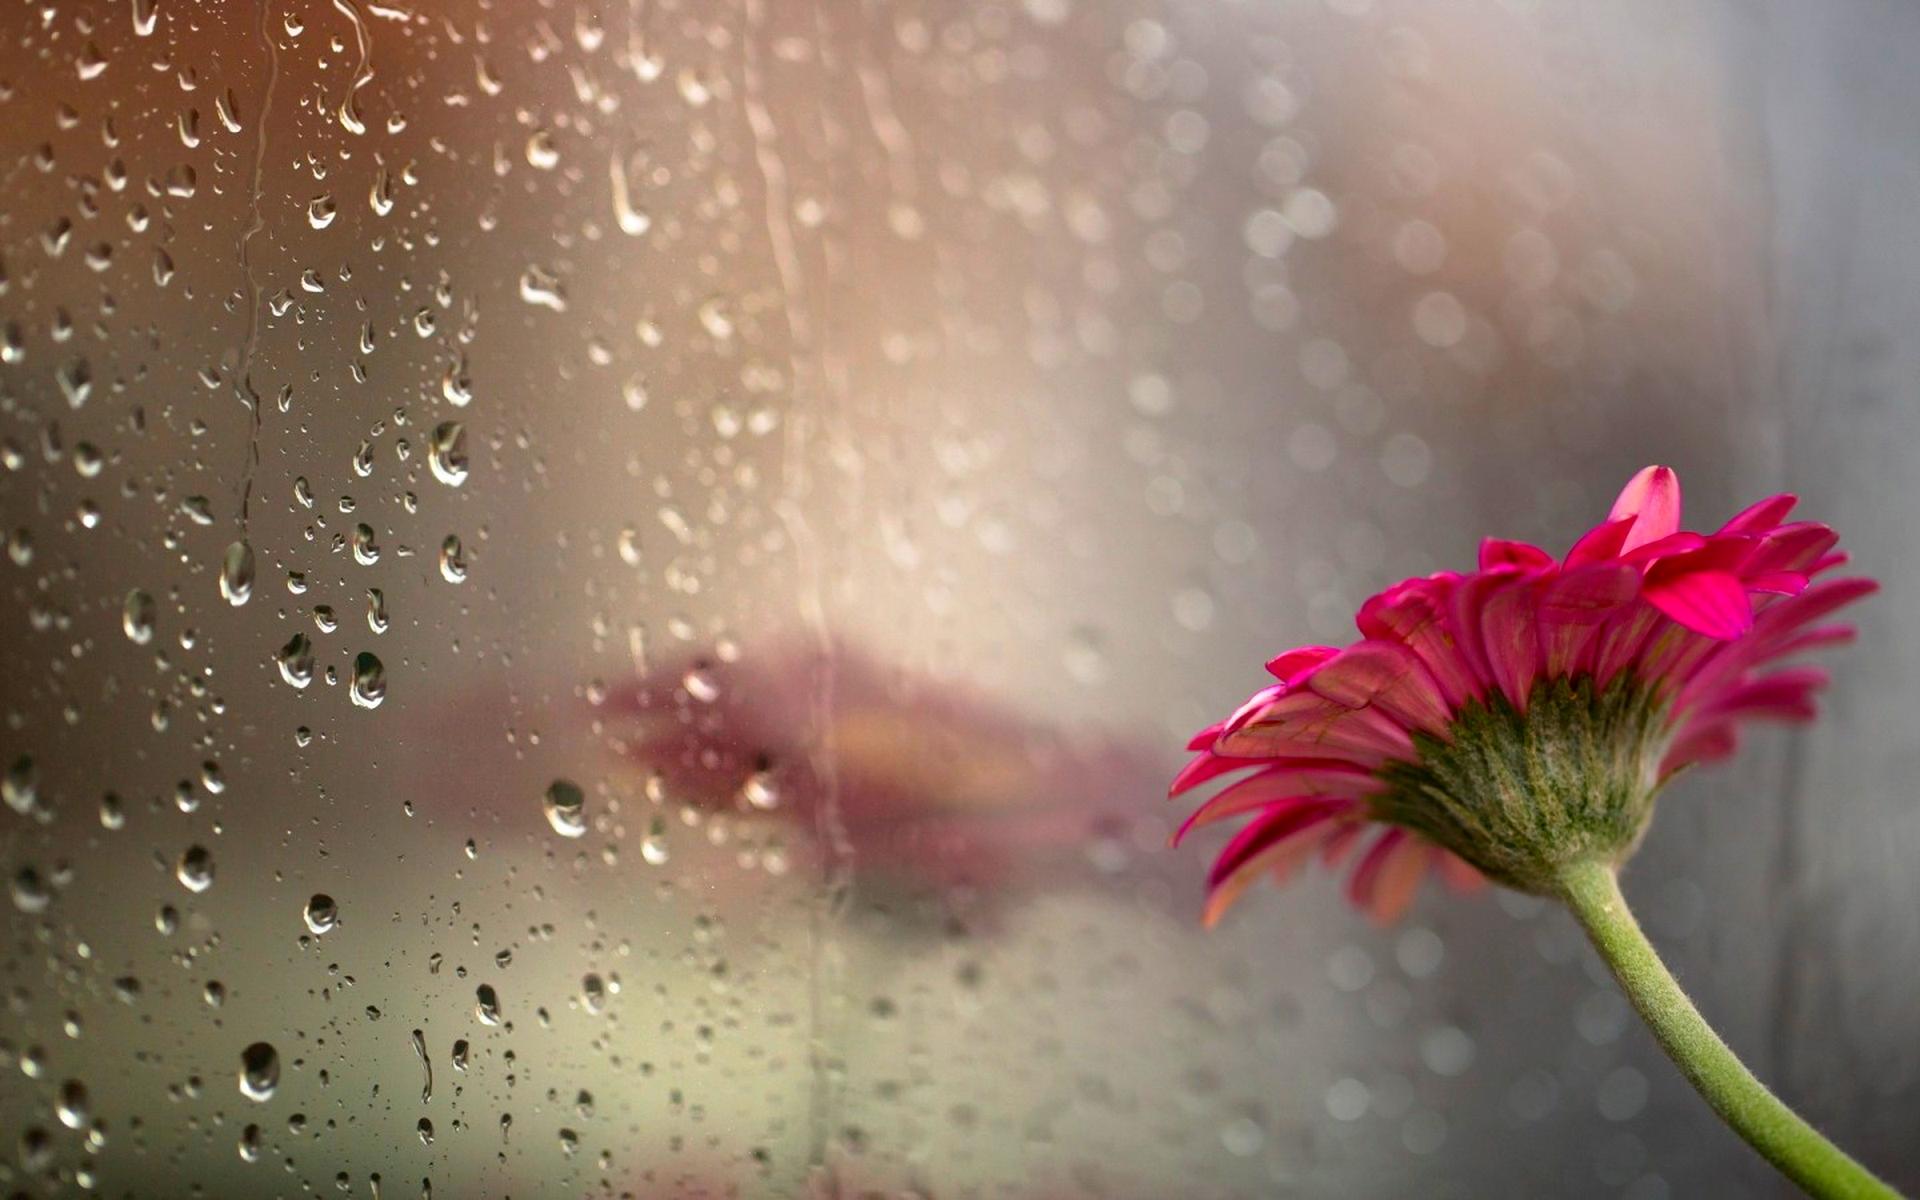 animated rain wallpapers 1366x768 - photo #33